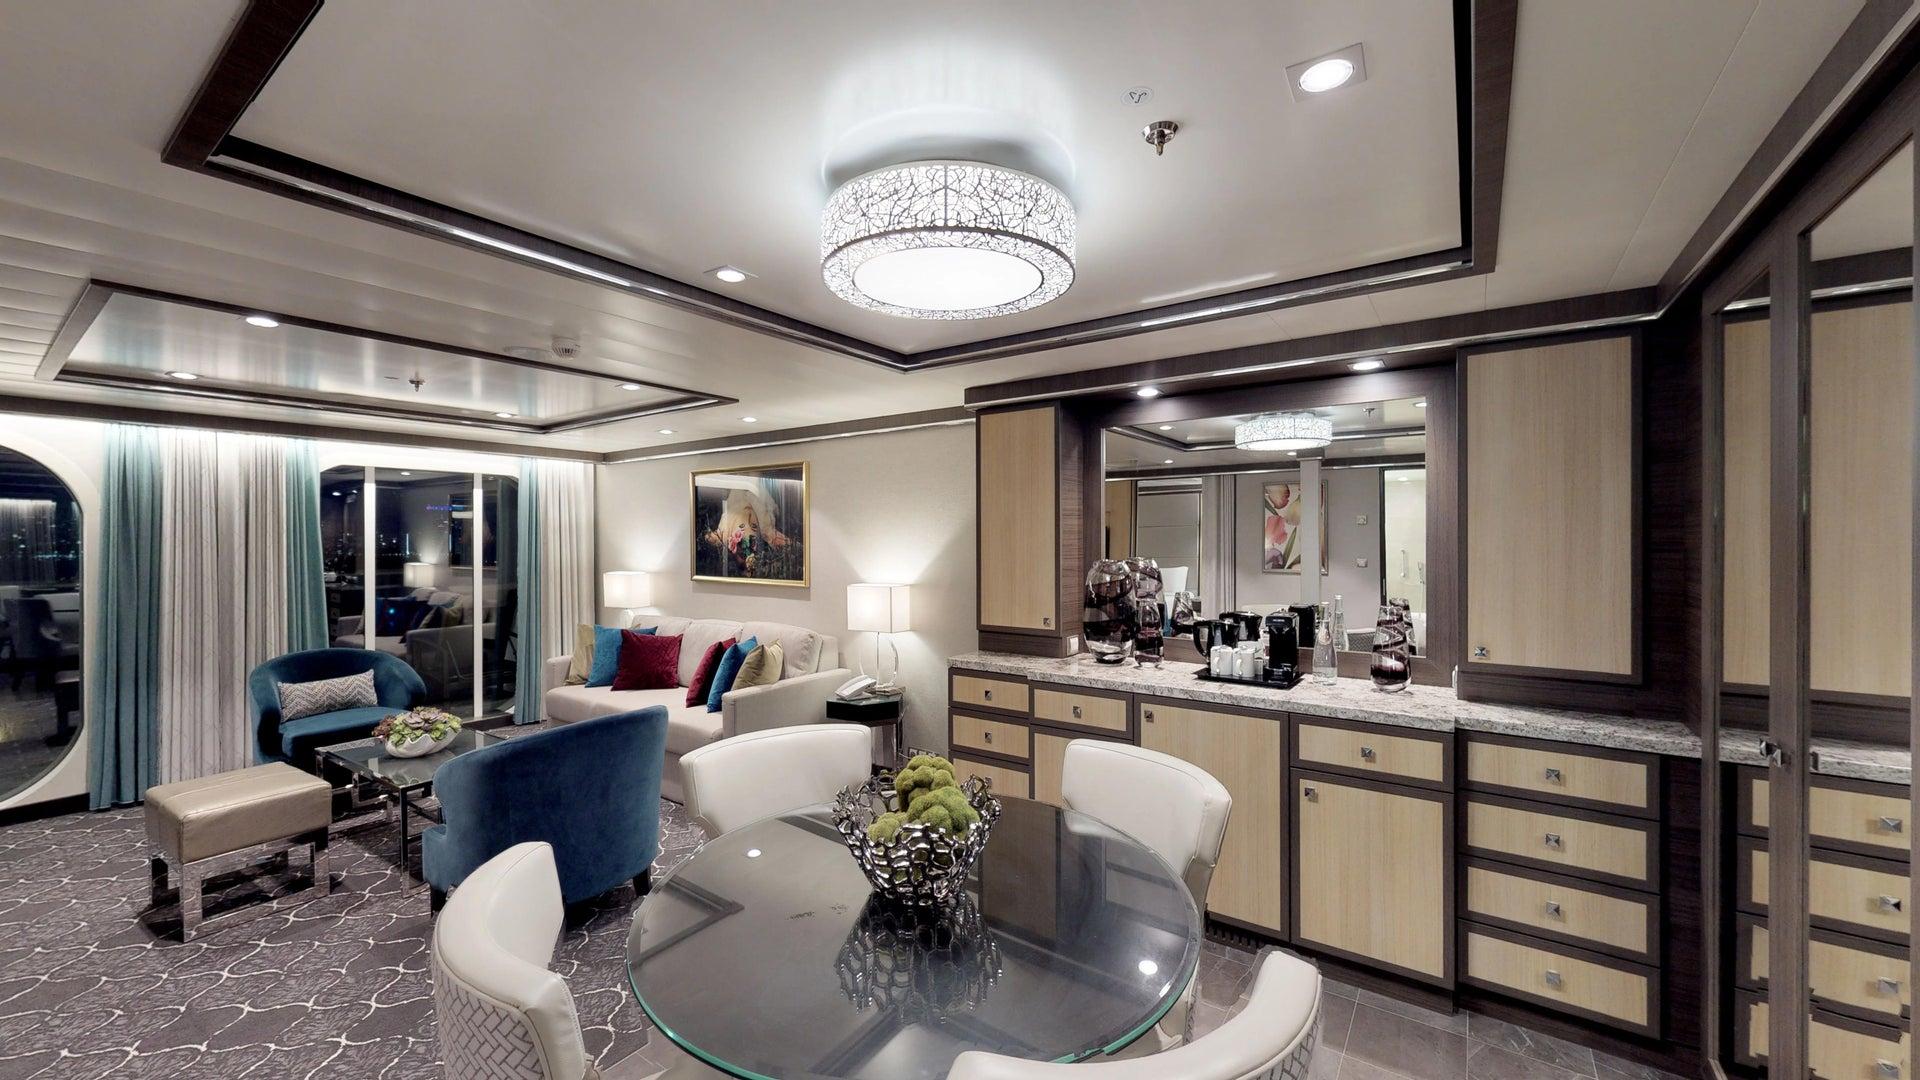 Cruise Ship Virtual Tours by Nuvo360